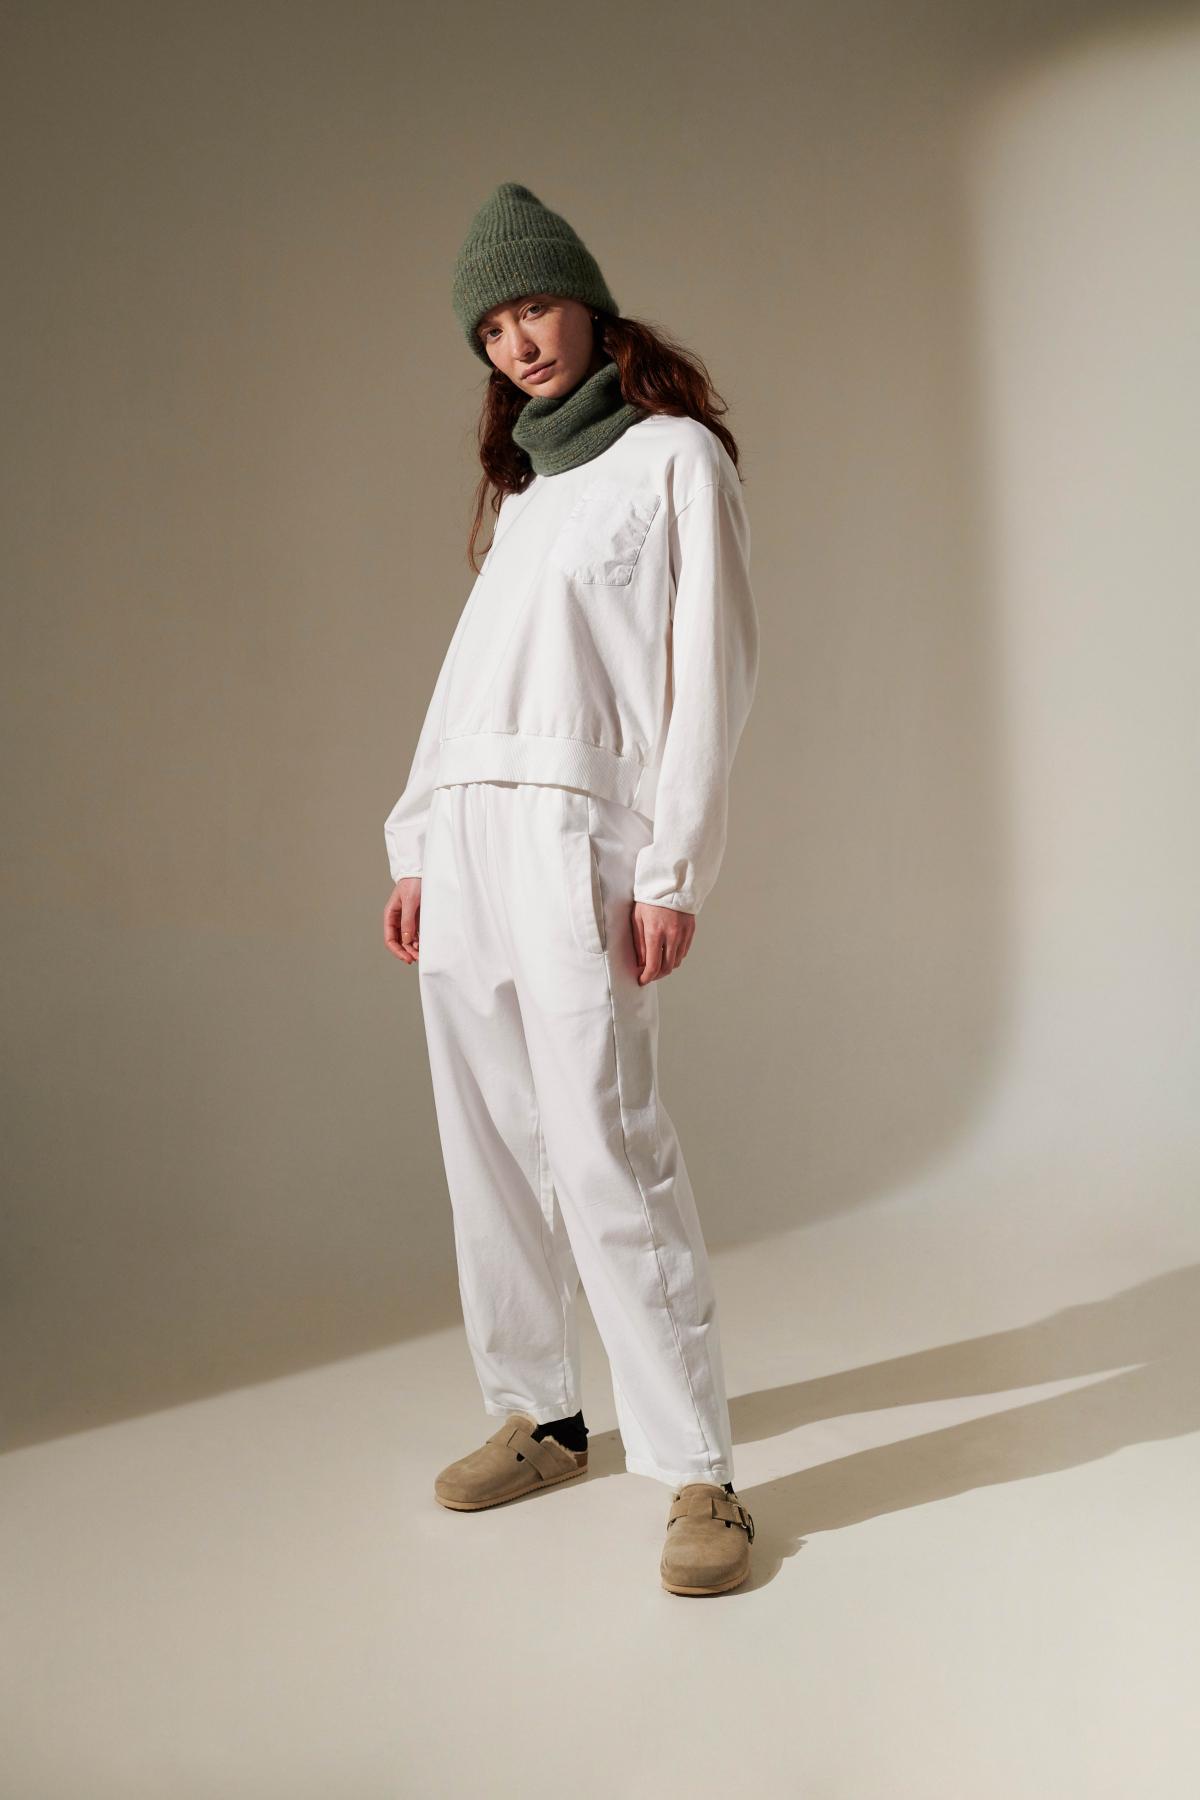 style TALENTOISI tshirt  style GUSTOSAMEX skirt